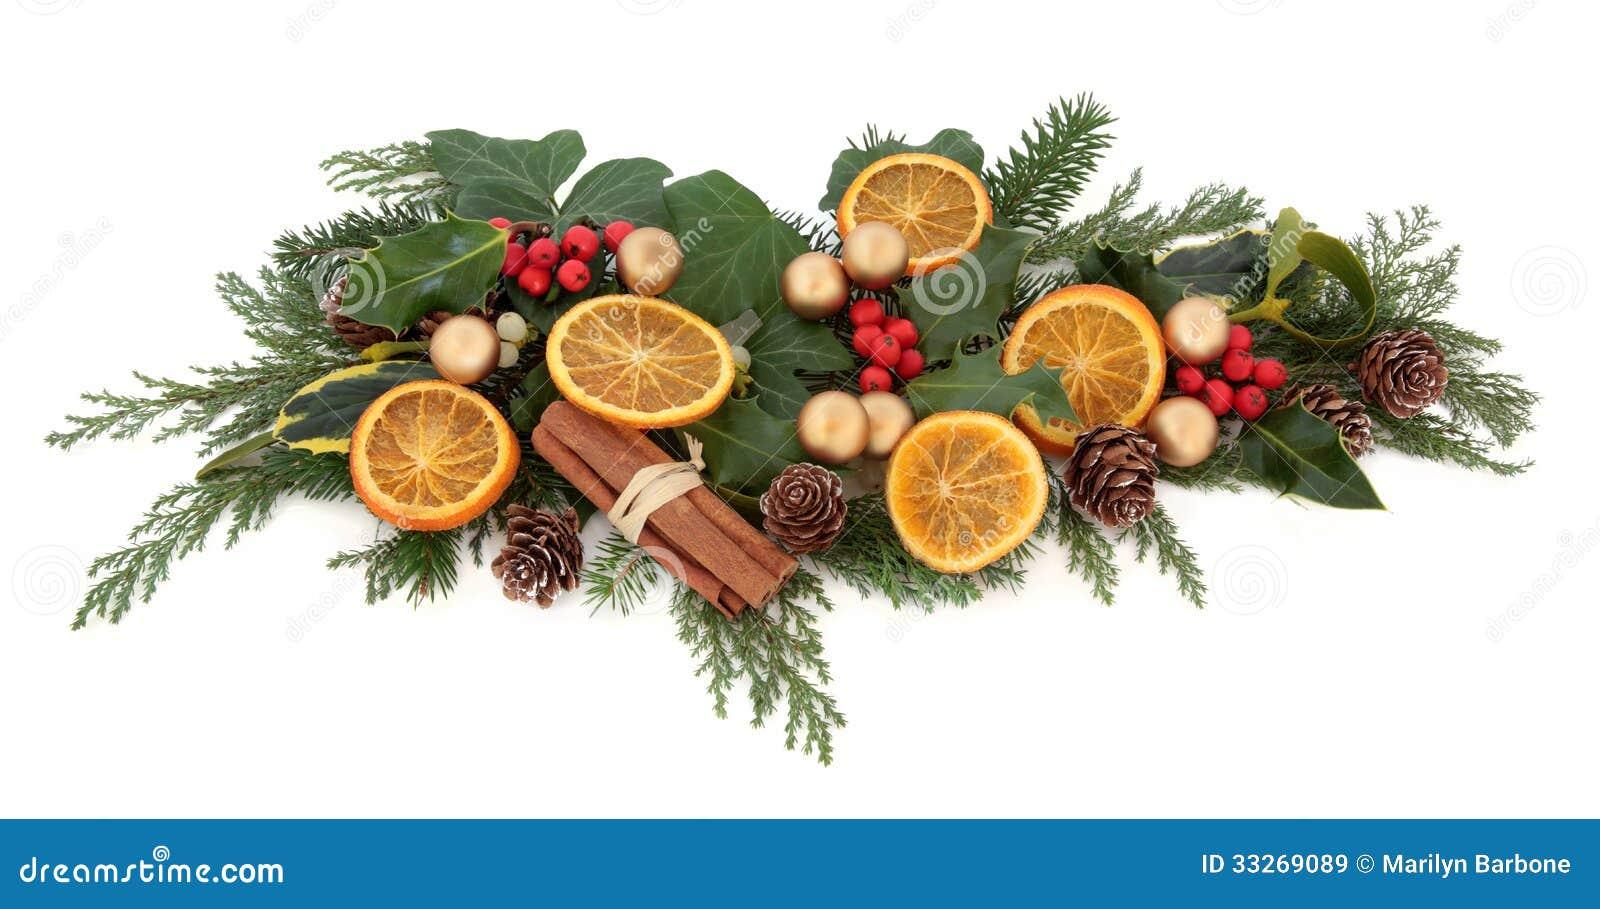 Christmas Decorative Display Stock Image Image 33269089